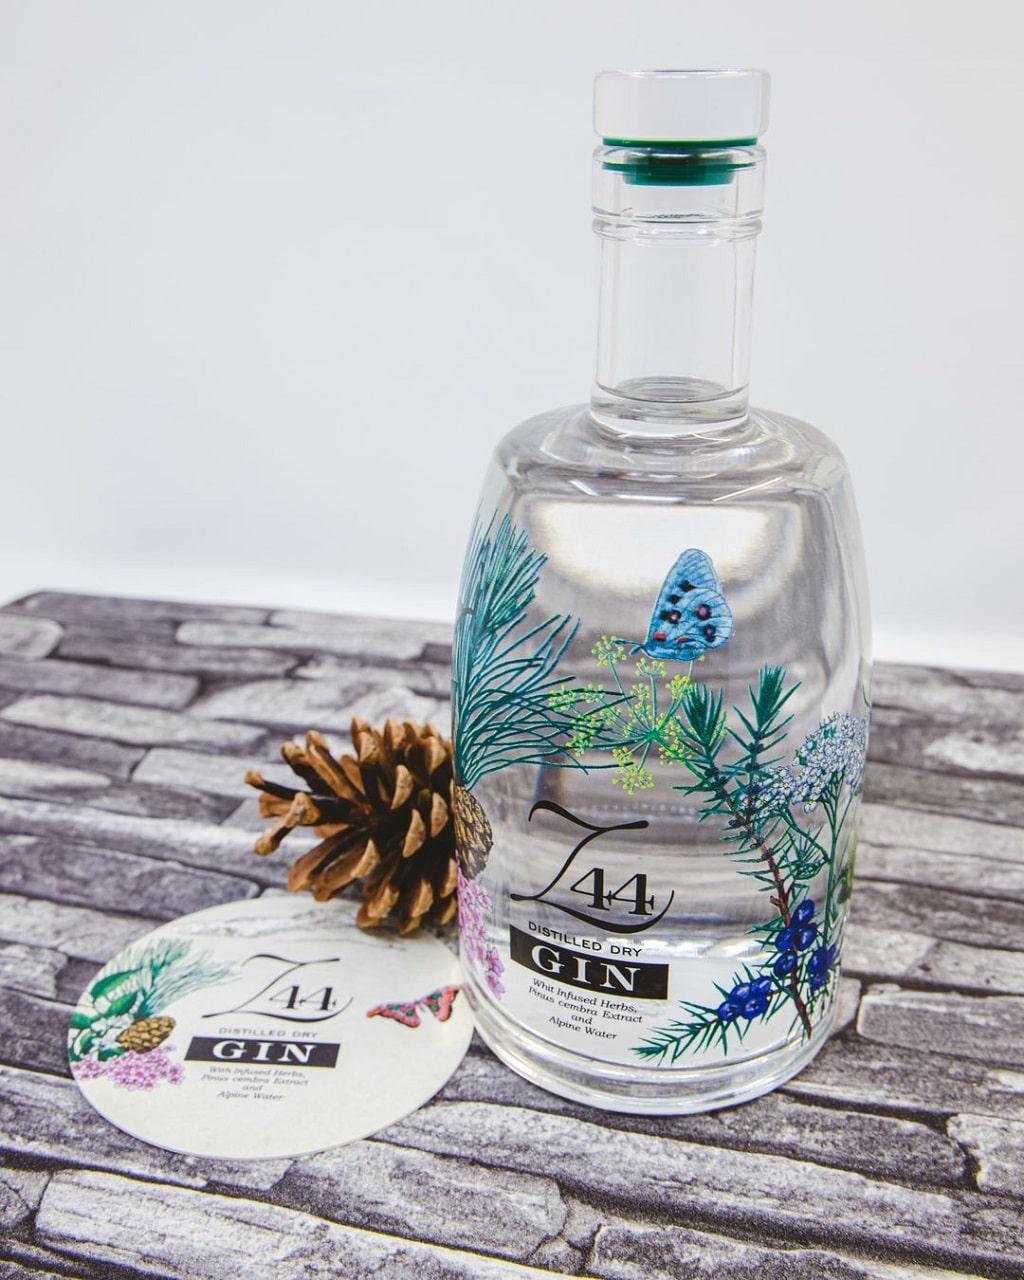 Gin italiani artigianali: Z44